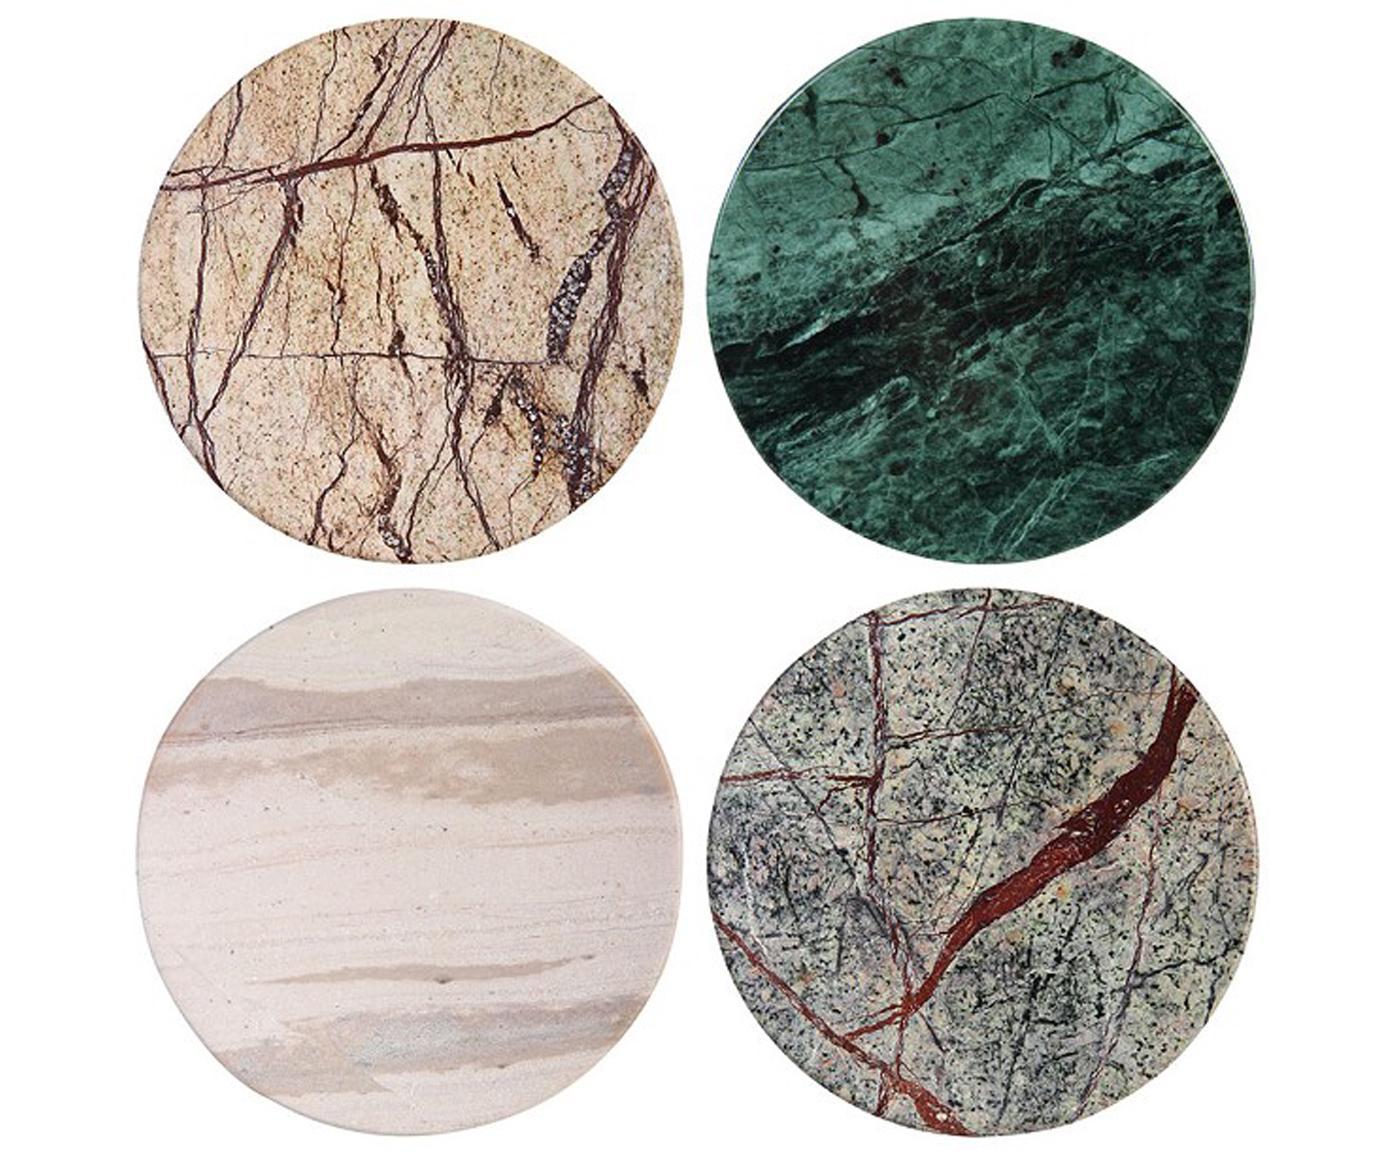 Set de posavasos de mármol Lidia, 4pzas., Mármol, Multicolor, Ø 10 cm